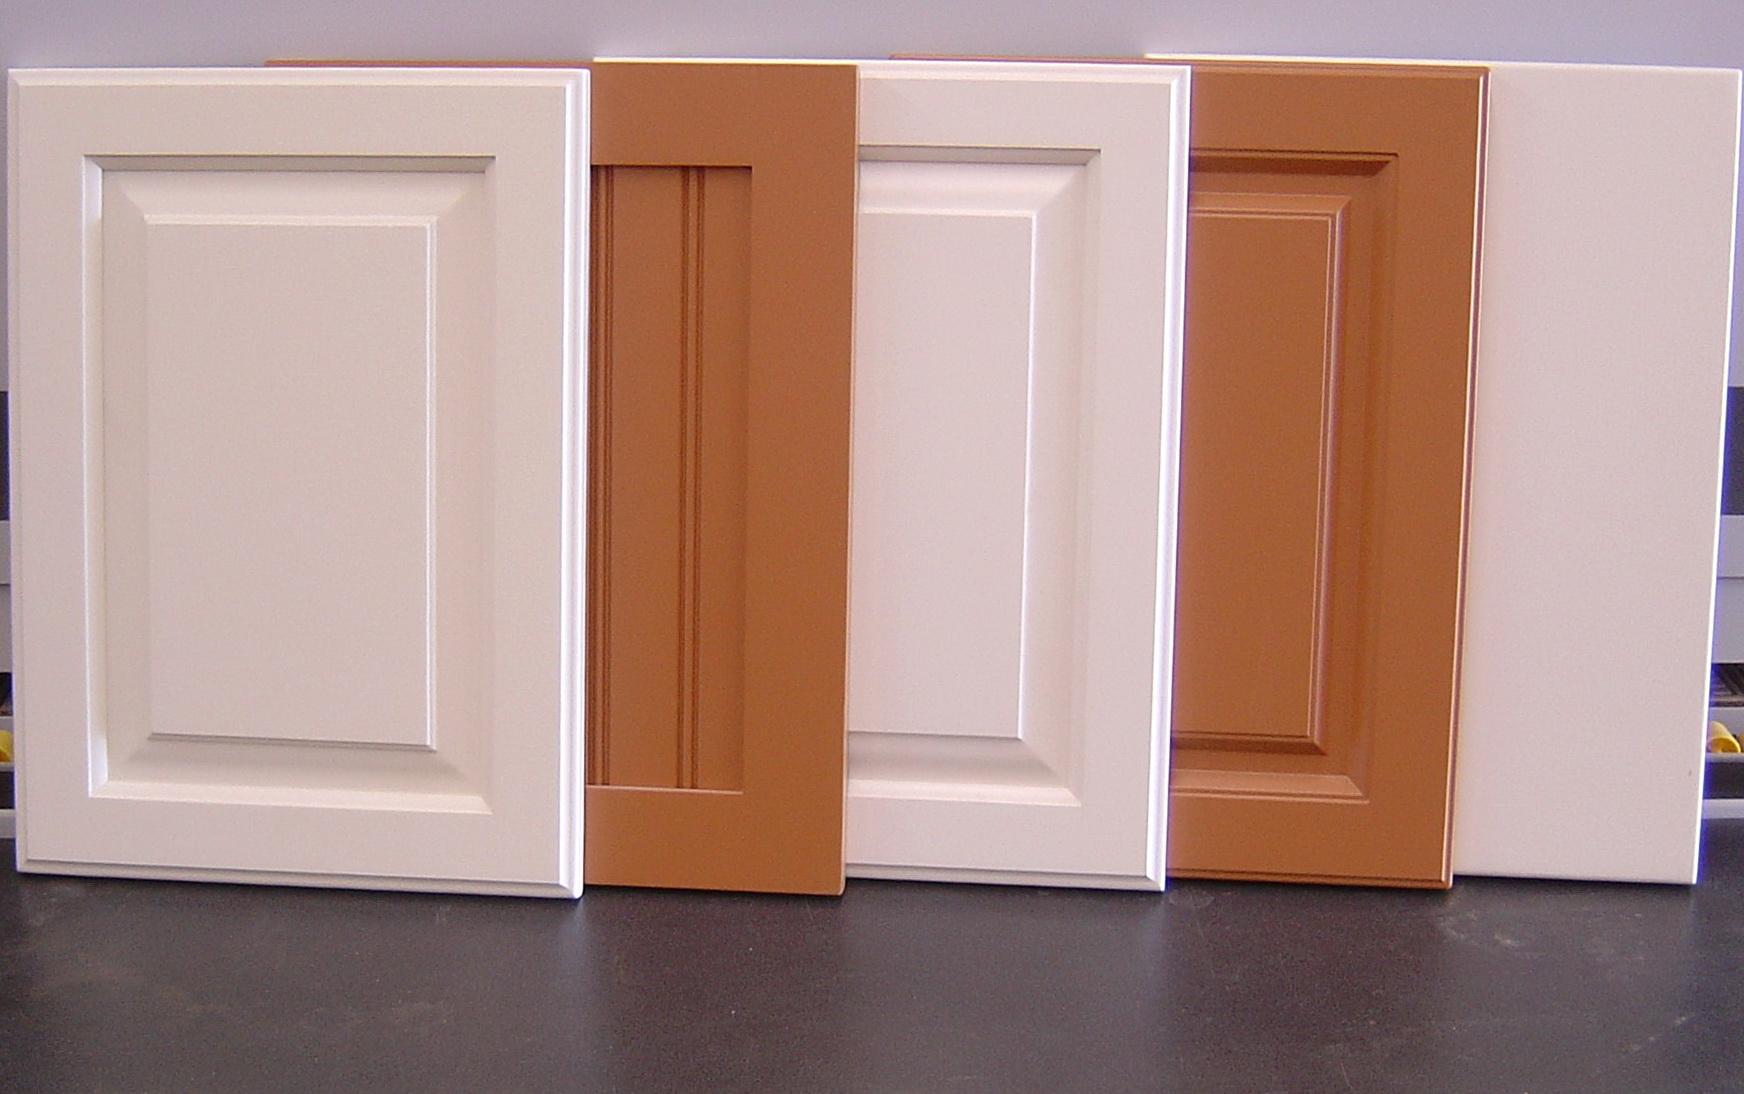 Mdf Cabinet Doors Painted